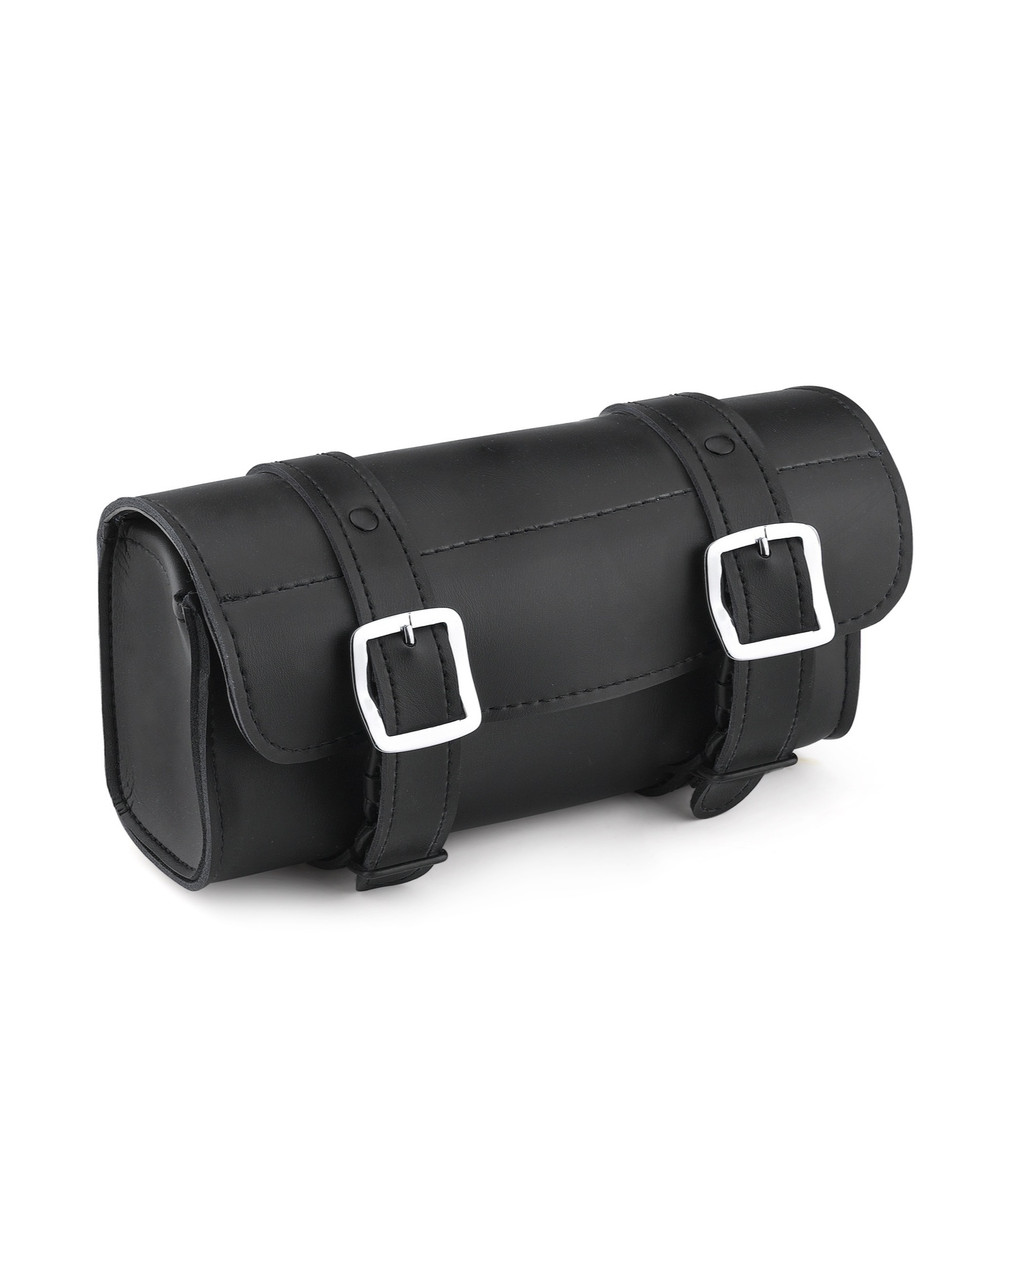 Kawasaki Armor Plain Motorcycle Tool Bag Main Bag View